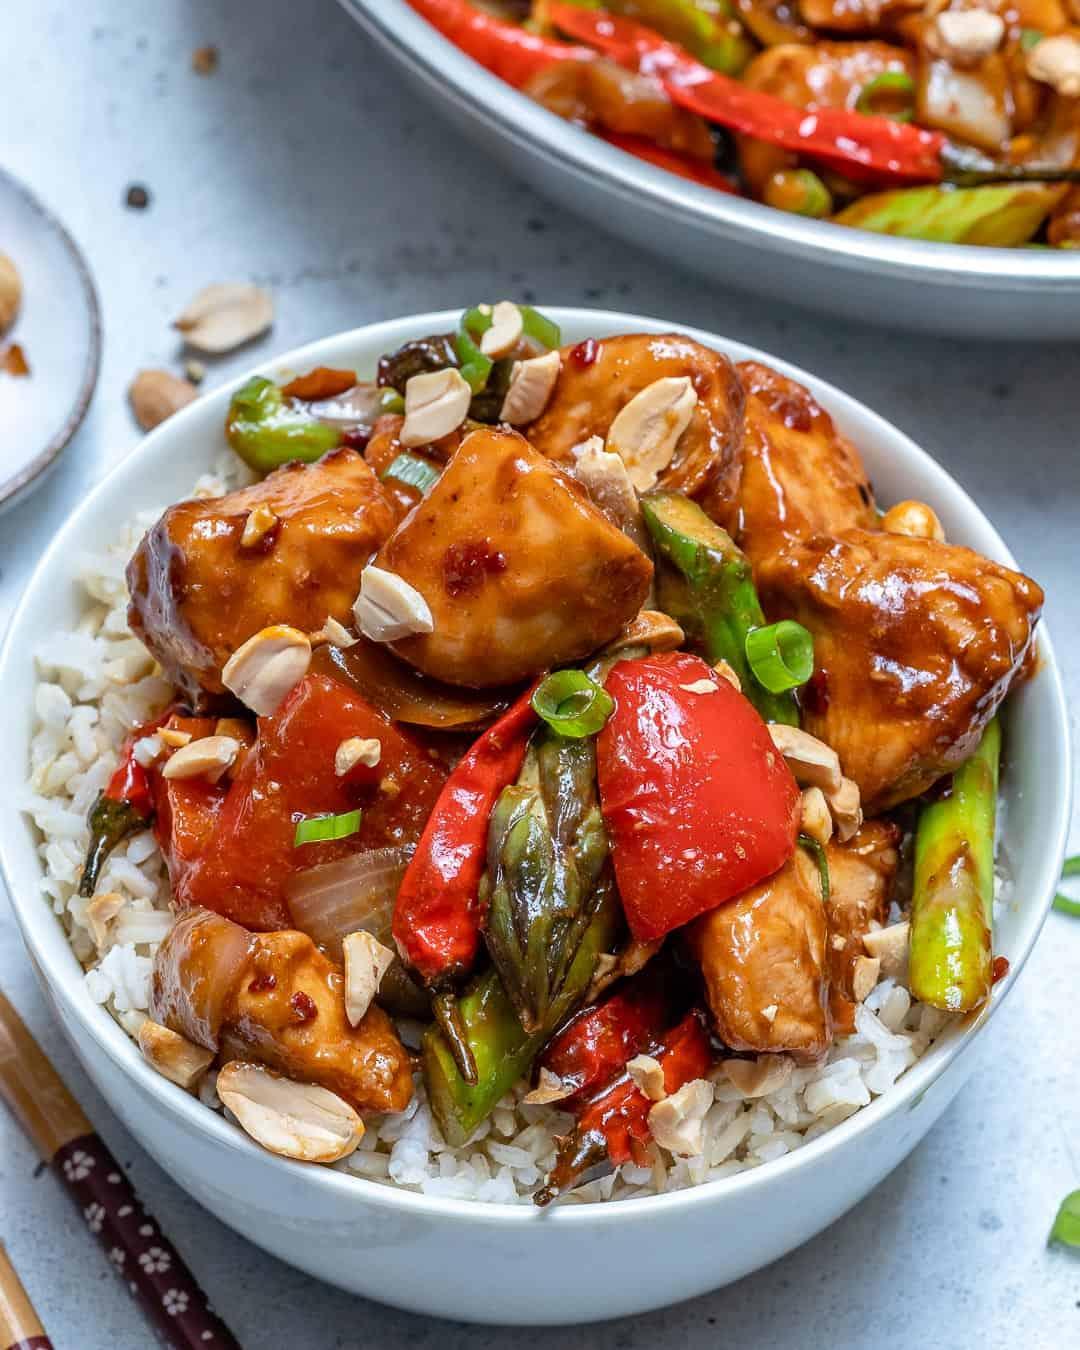 Chinese chicken stir-fry recipe with veggies